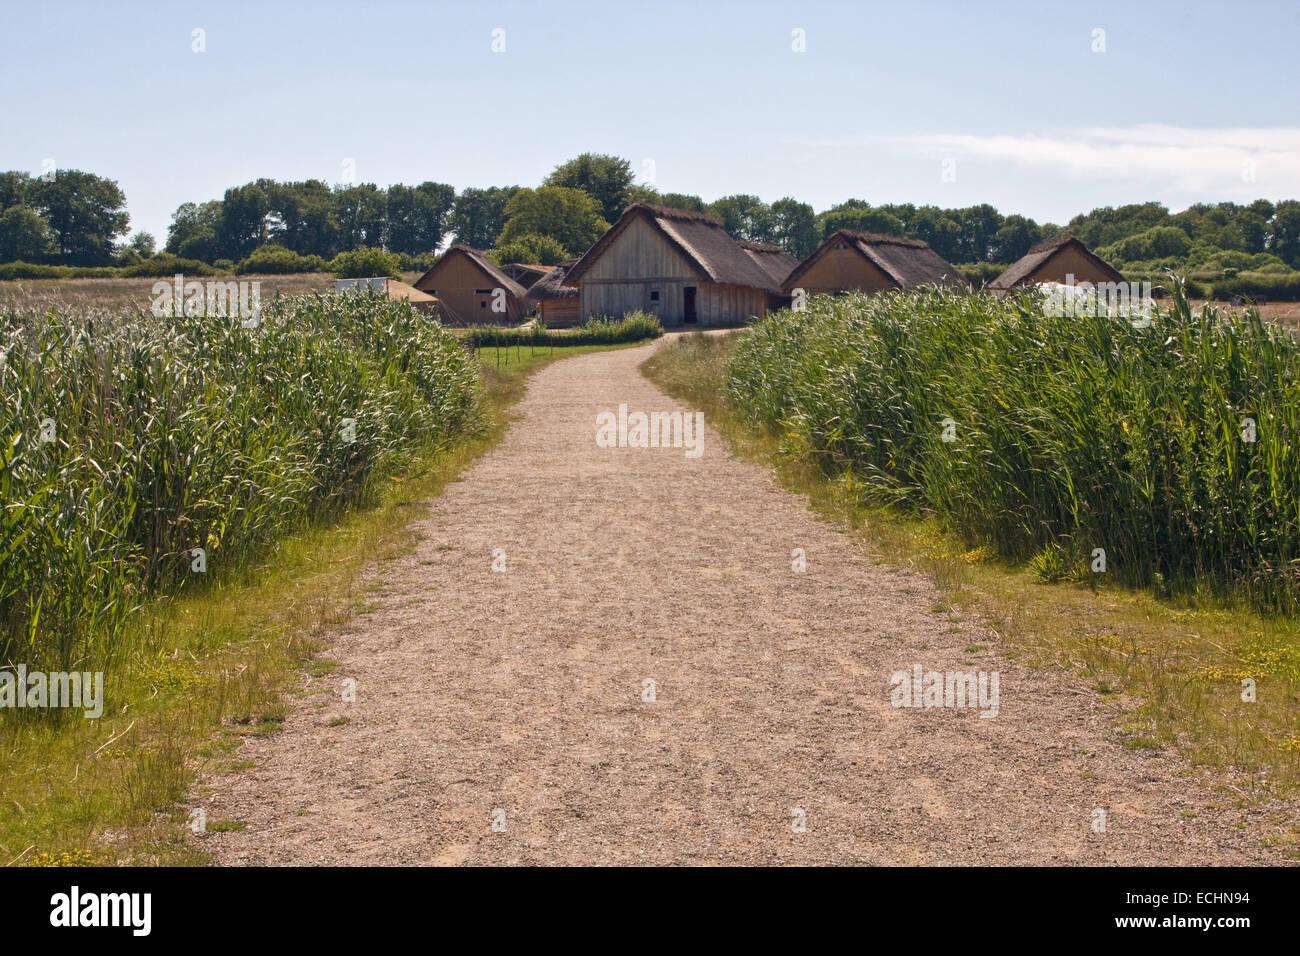 Haithabu, Haddeby, Hedeby, Haddebyer Noor, Schleswig-Holstein, Germany, Europe - Stock Image